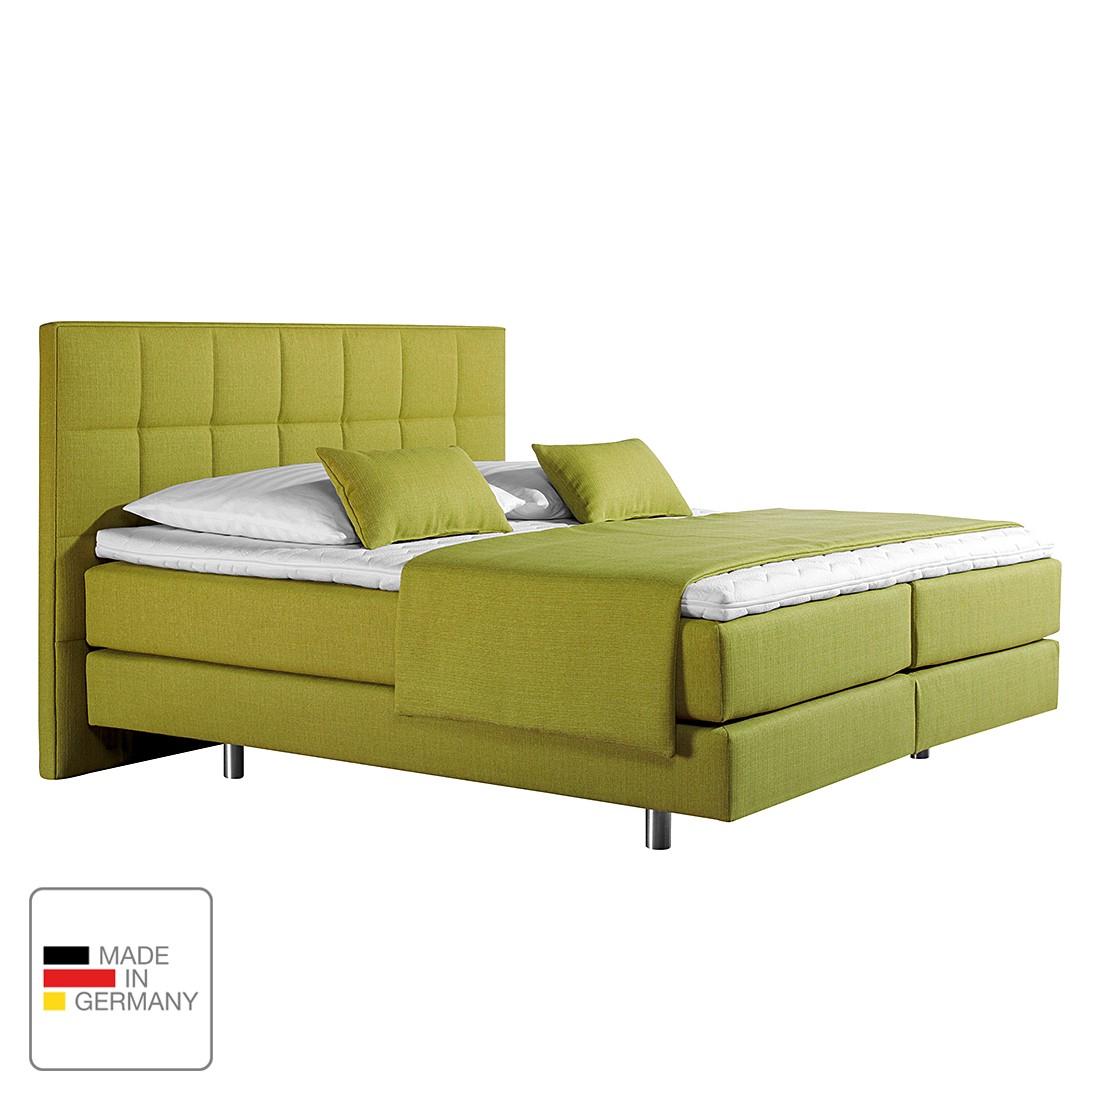 boxspringbett tevin webstoff 160 x 200cm h2 bis 80 kg tonnentaschenfederkernmatratze. Black Bedroom Furniture Sets. Home Design Ideas